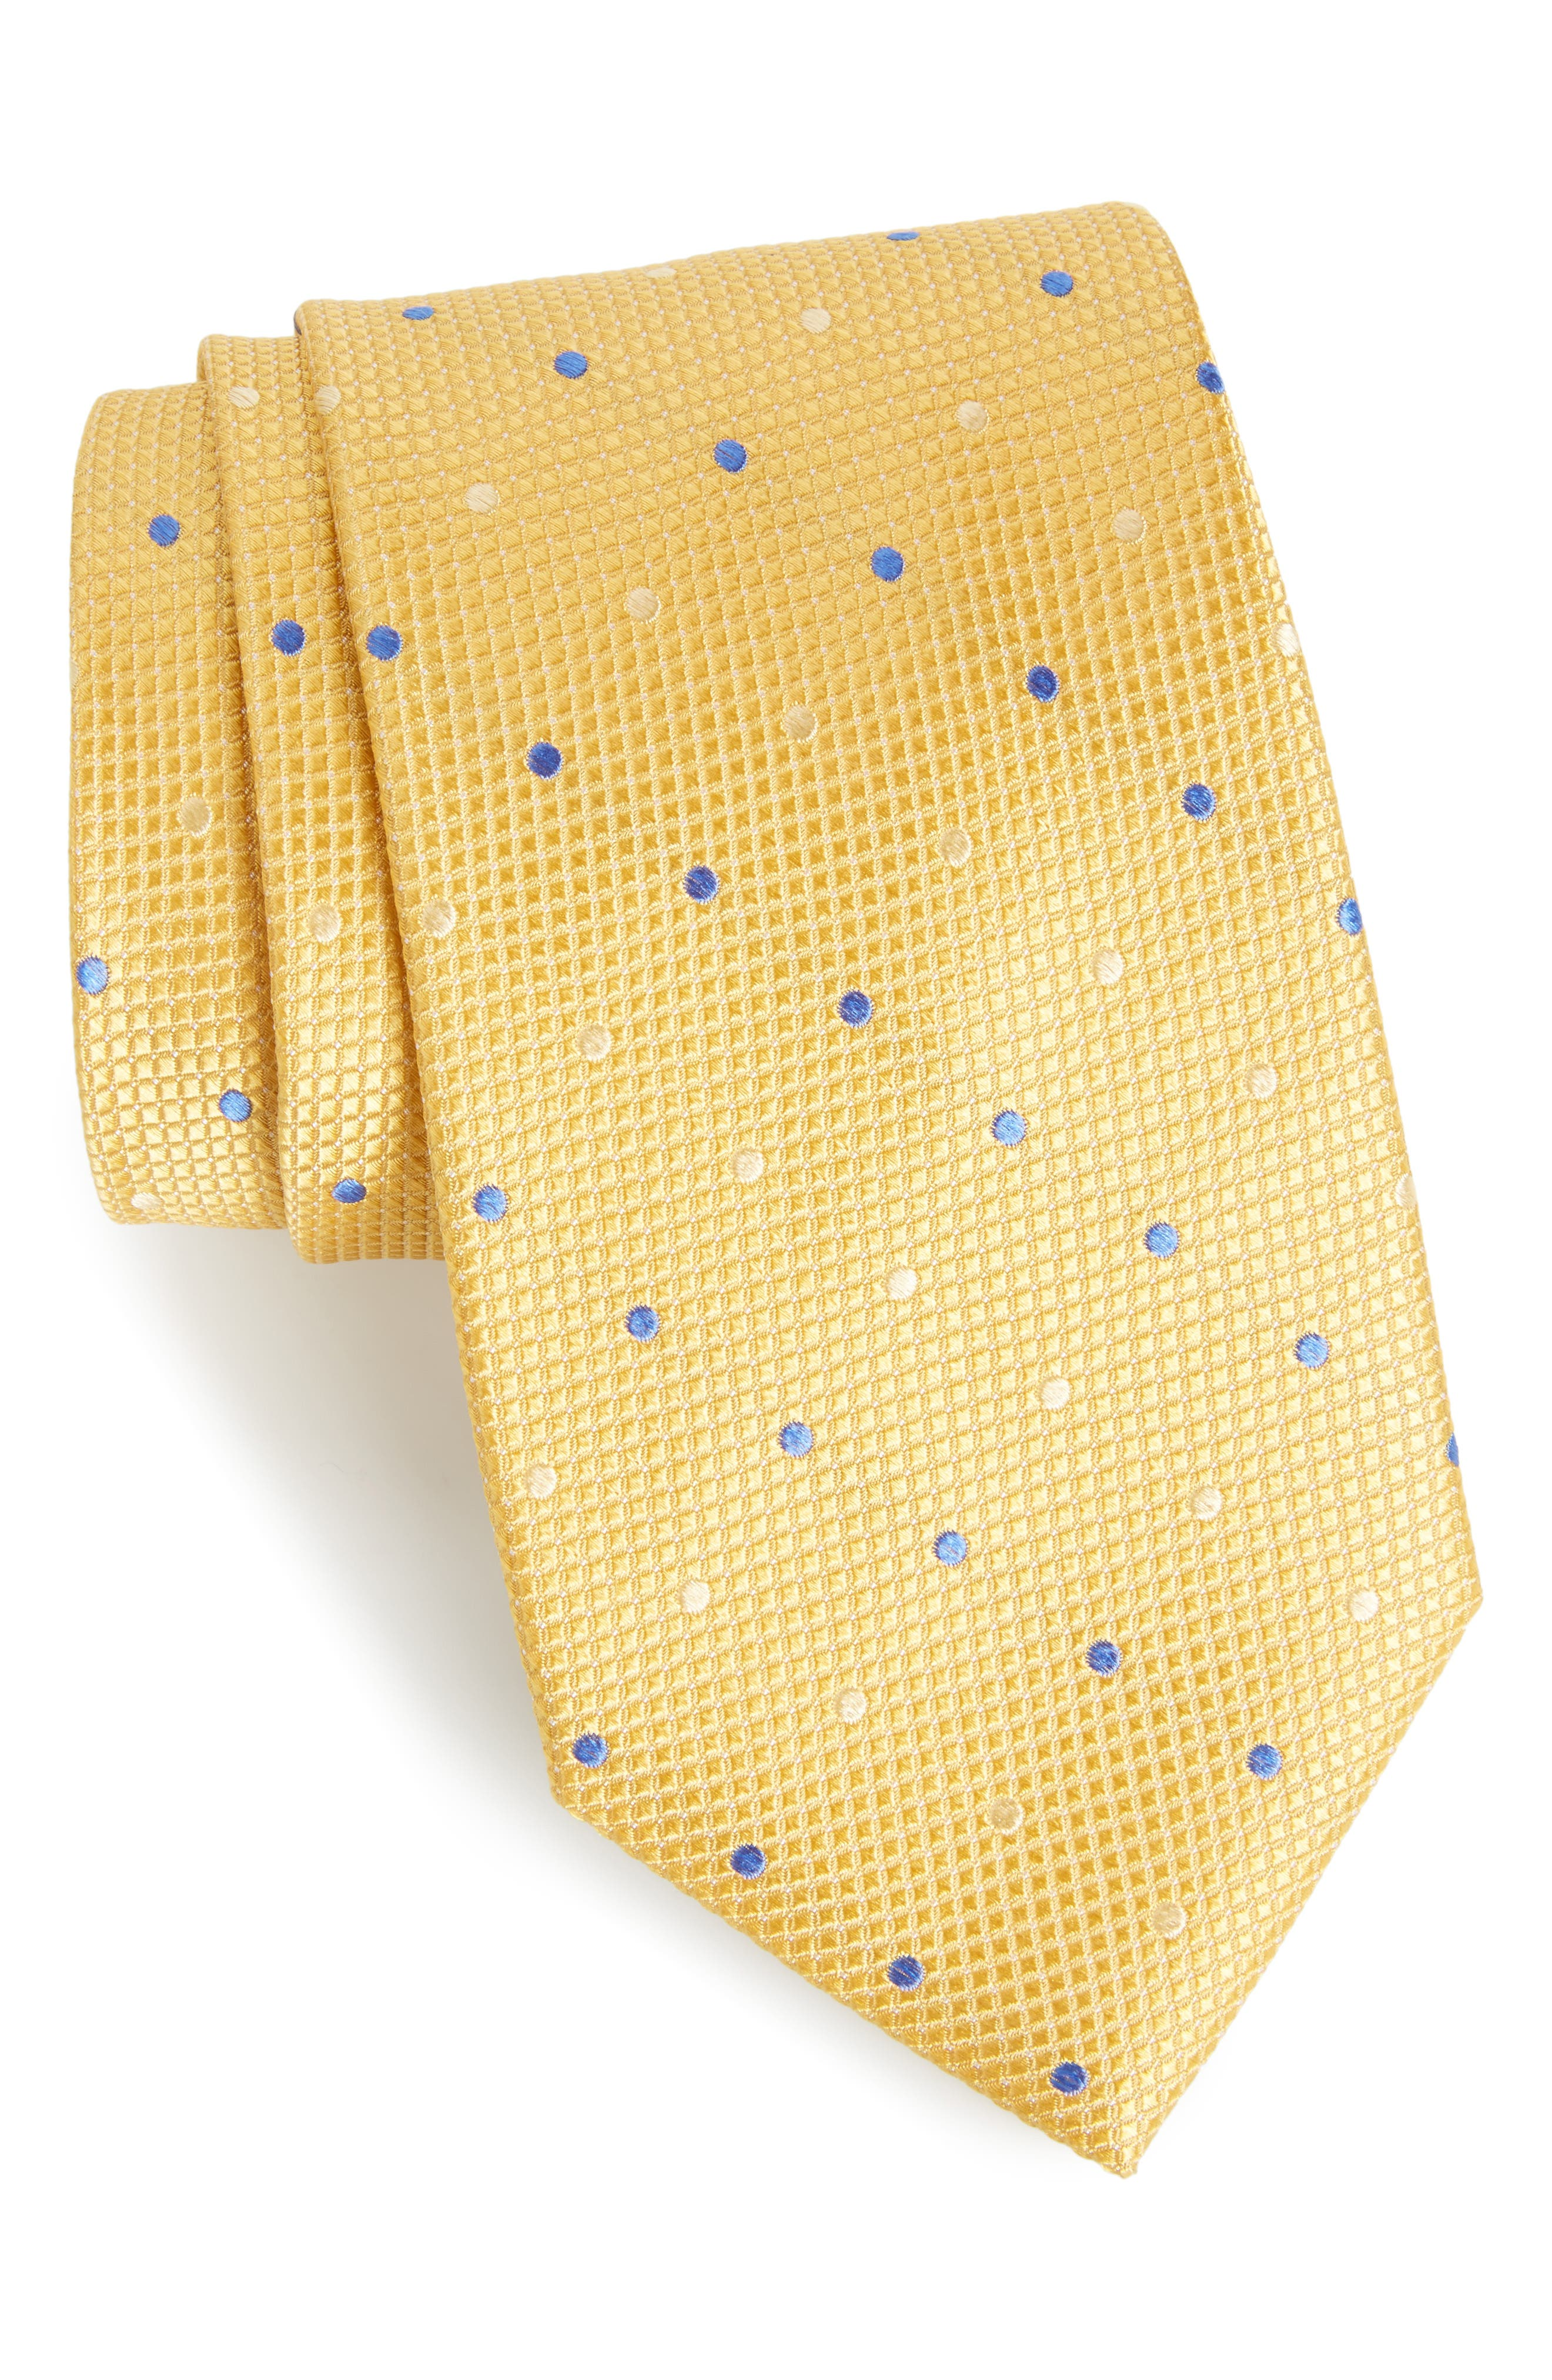 Alternate Image 1 Selected - Nordstrom Men's Shop Graphic Dots Silk Tie (X-Long)